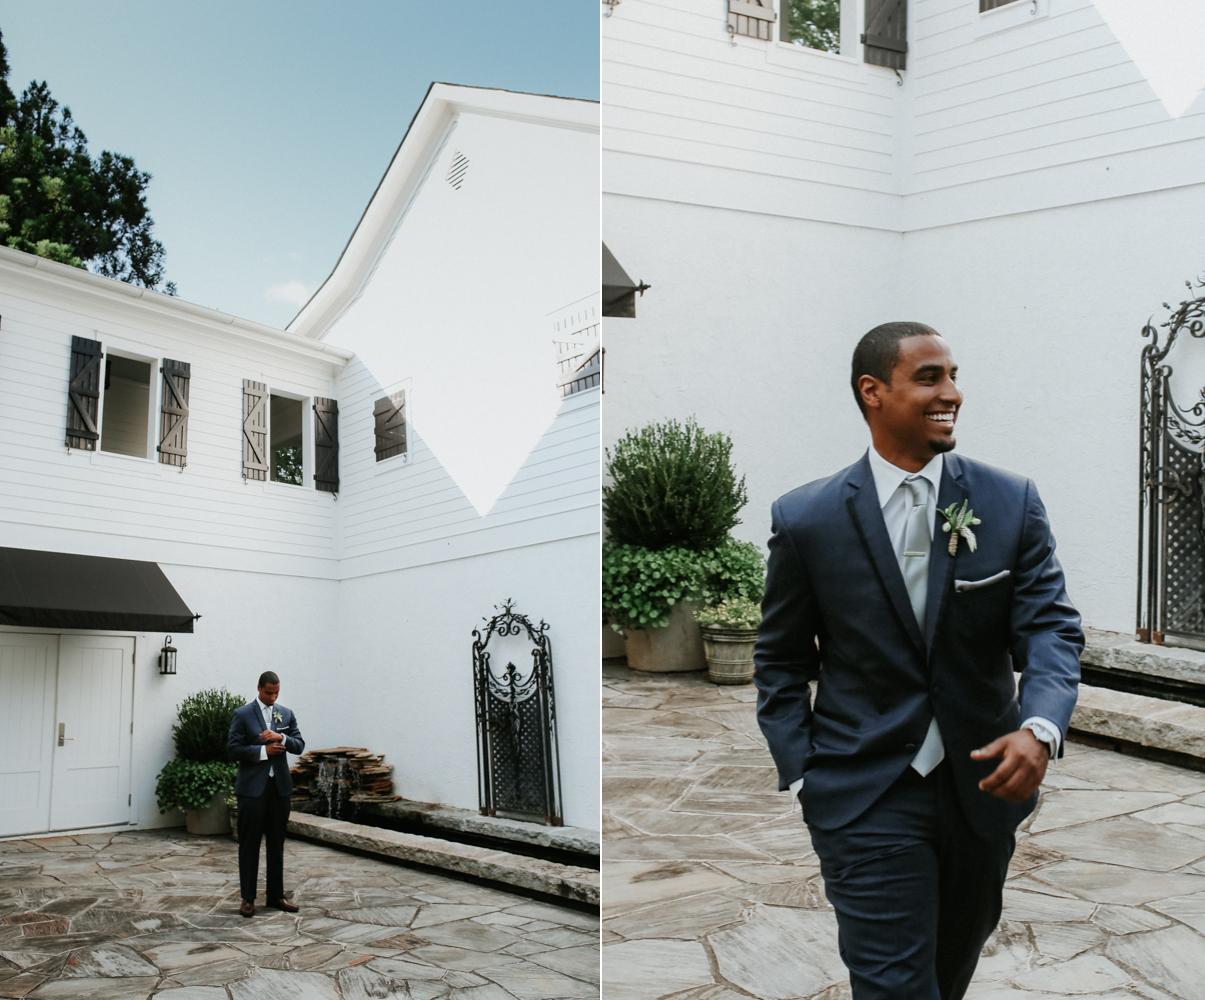 Atlanta_wedding_photographer_Inn_at_Serembe_intimate_elopement_sunset_artistic_photography_Gabriela_and_Felipe_doble15.jpg